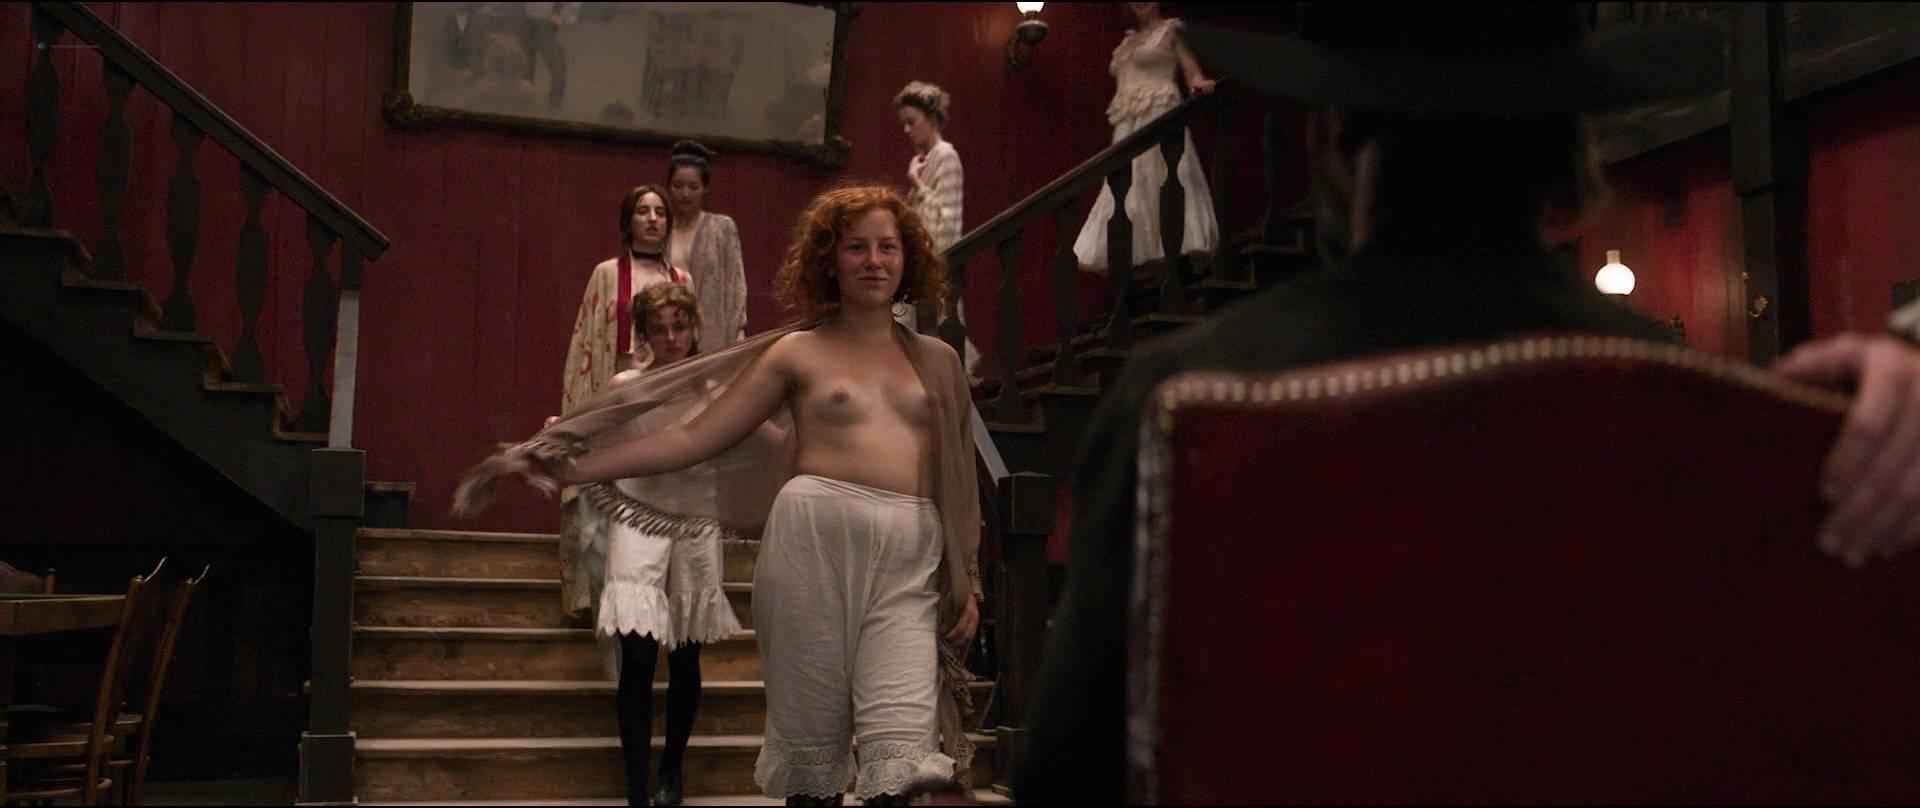 Dakota Fanning hot, Carla Juri, Vera Vitali others nude bush - Brimstone (2016) HD 1080p BluRay (12)